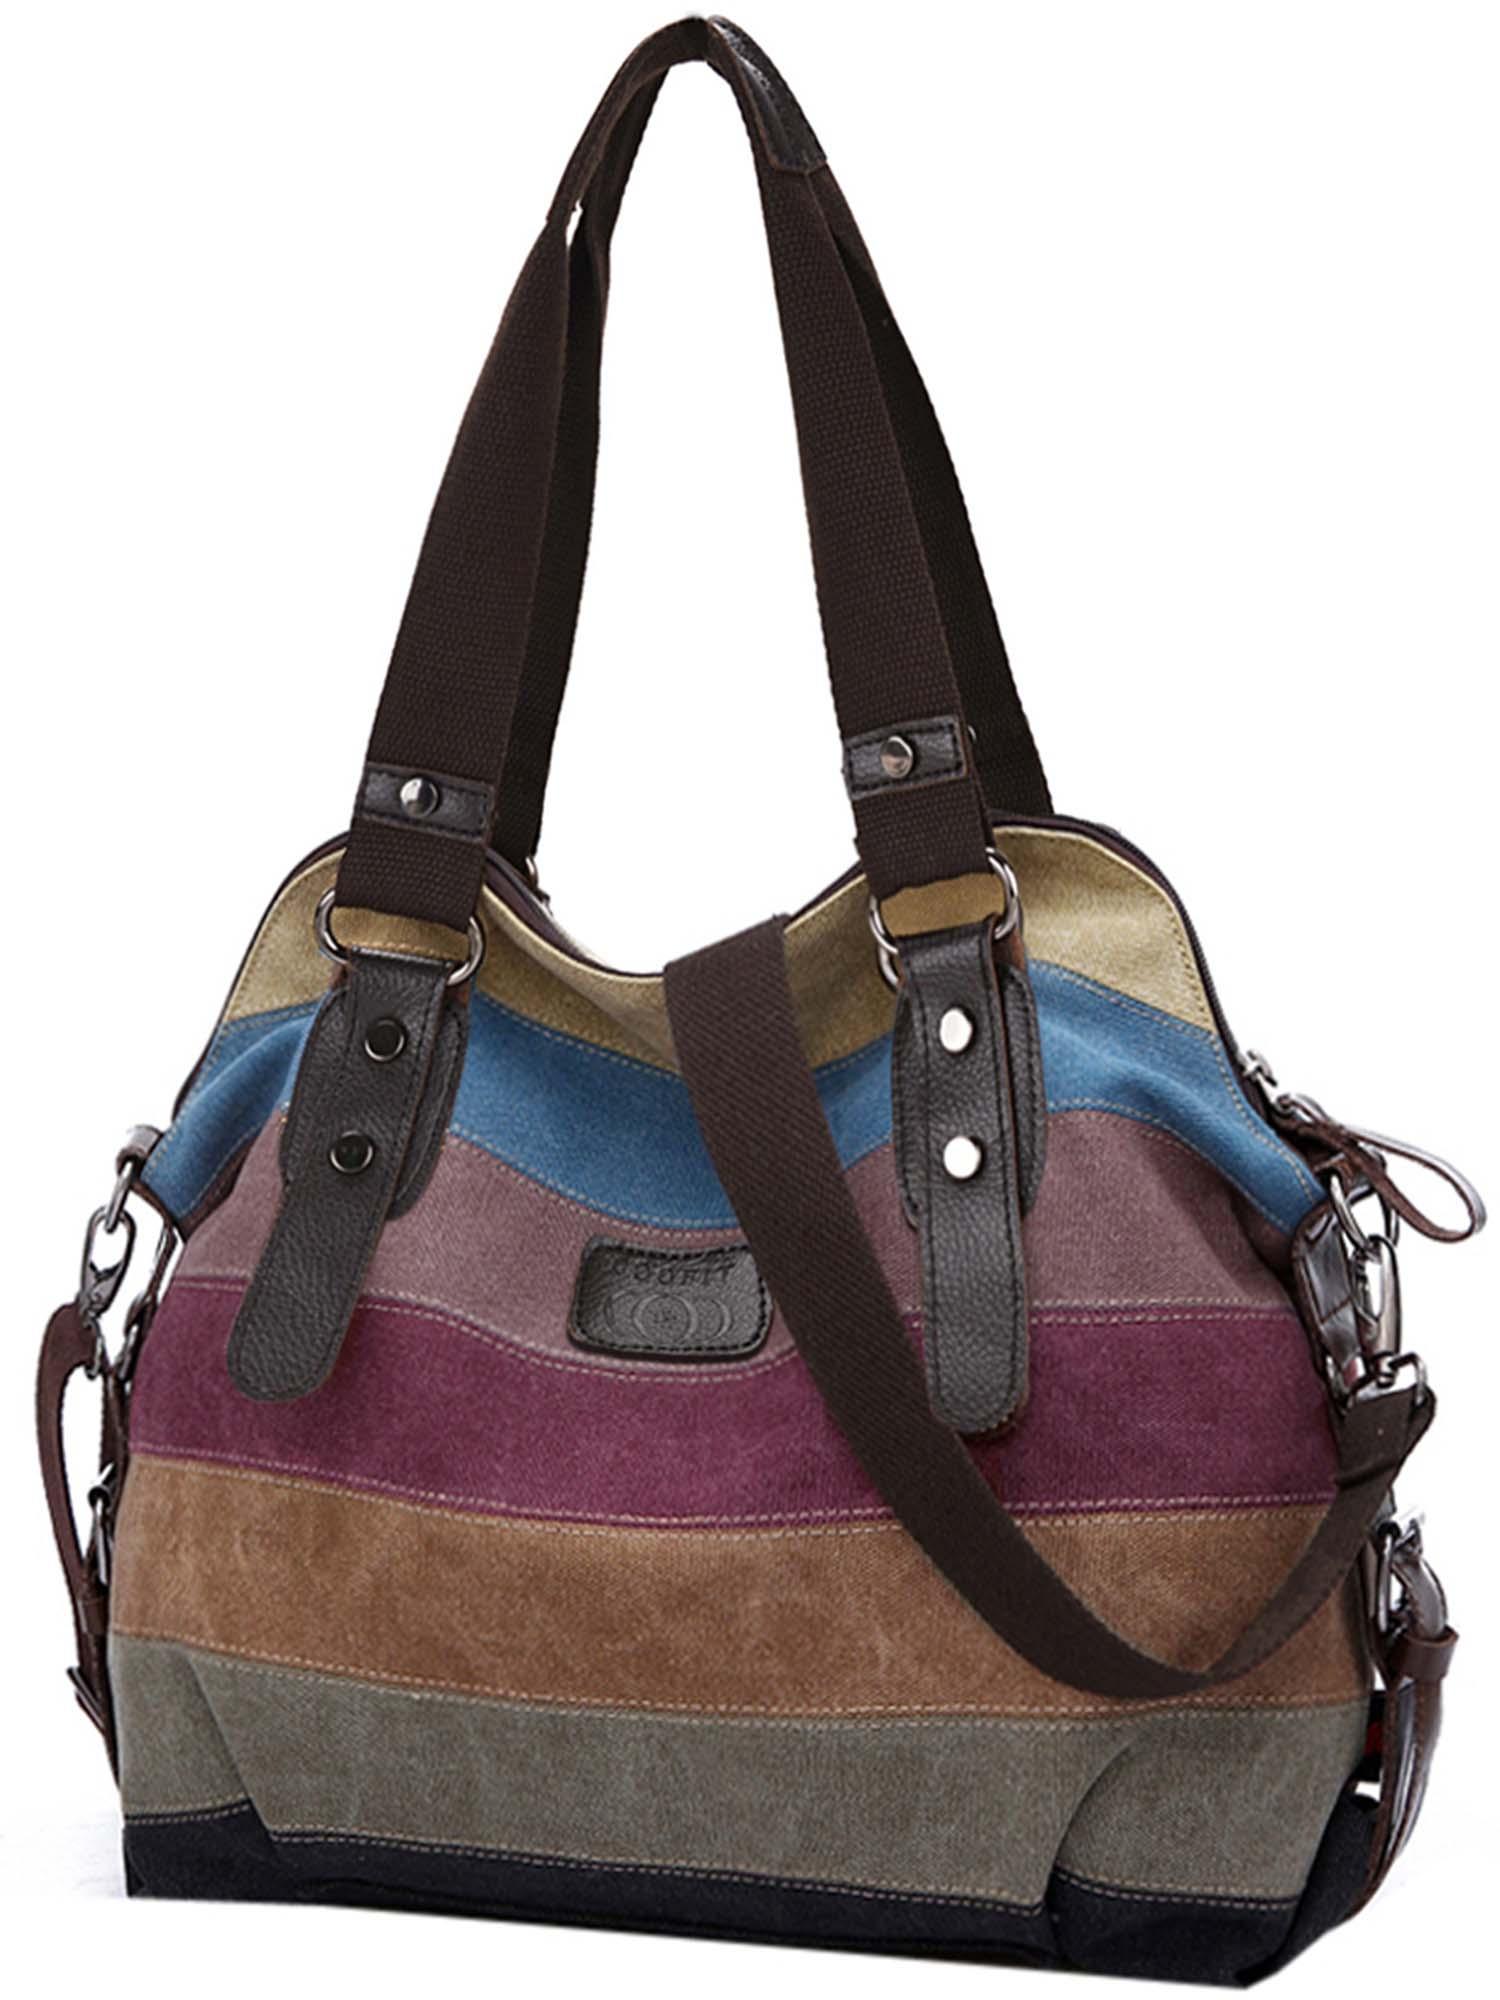 Handbags for Women, Coofit Multicolor Stripe Leisure Canvas Shoulder Bag Cross Body...